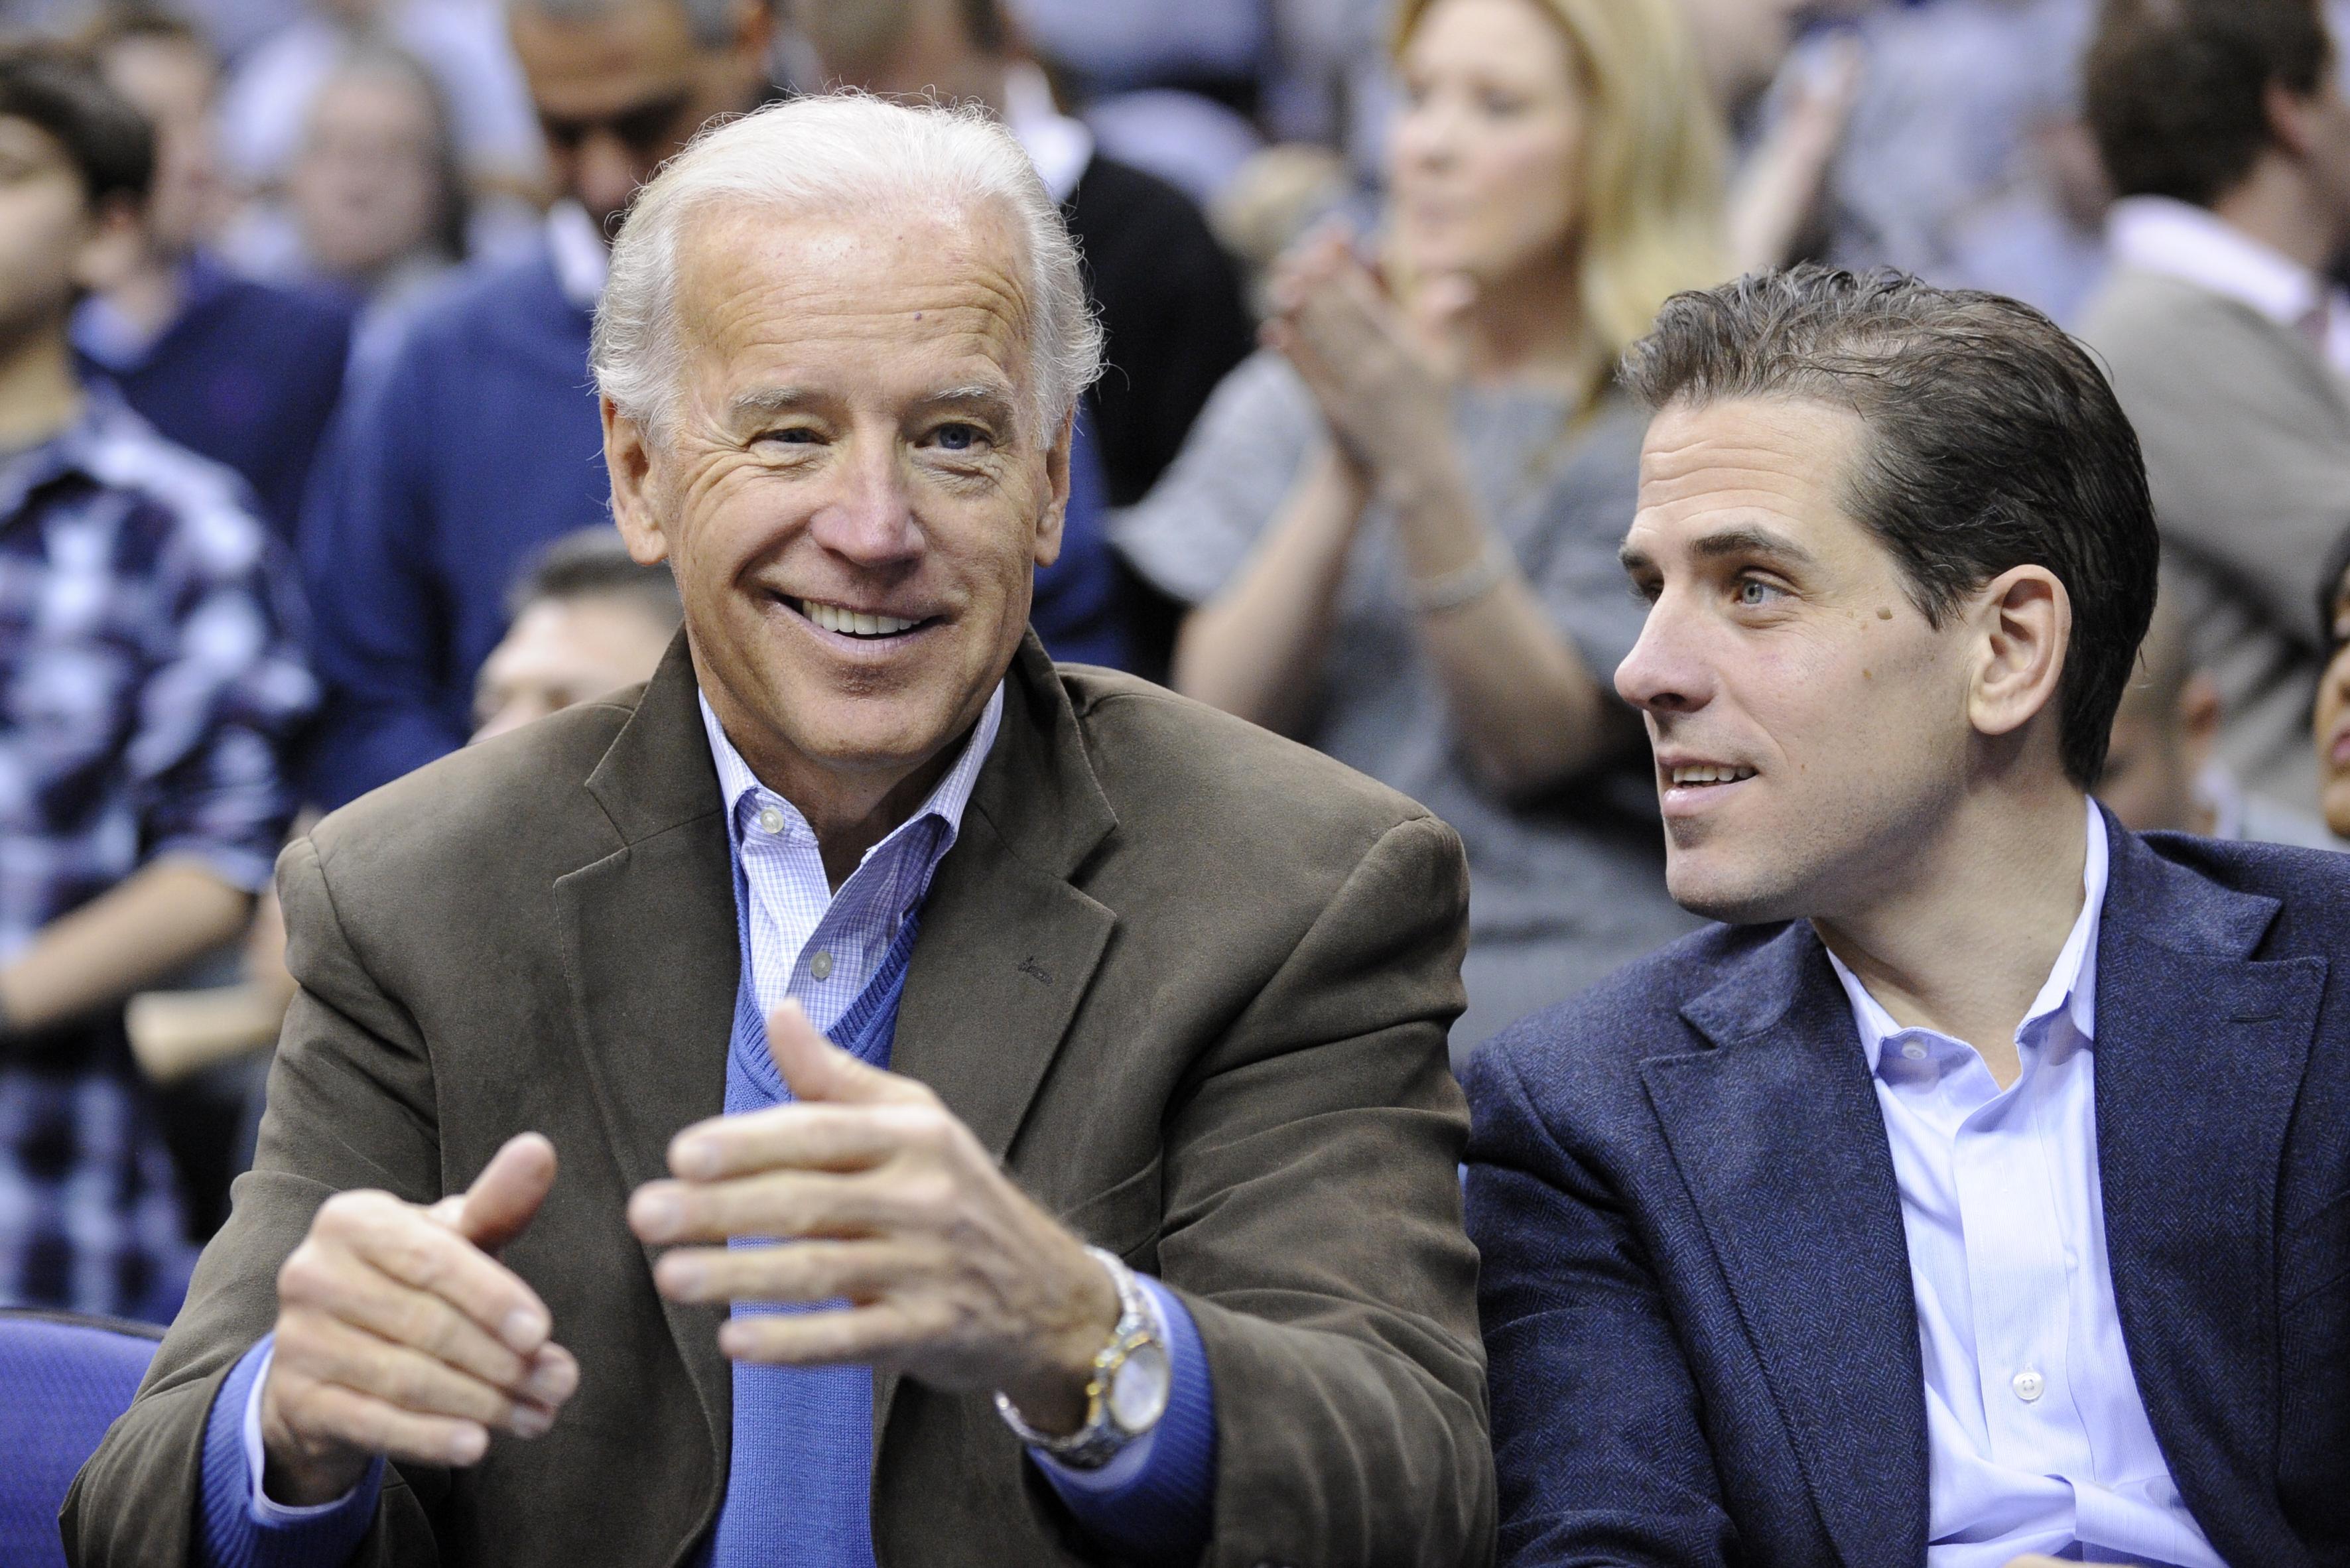 Hunter Biden expresses regrets about 'poor judgment' for overseas business dealings